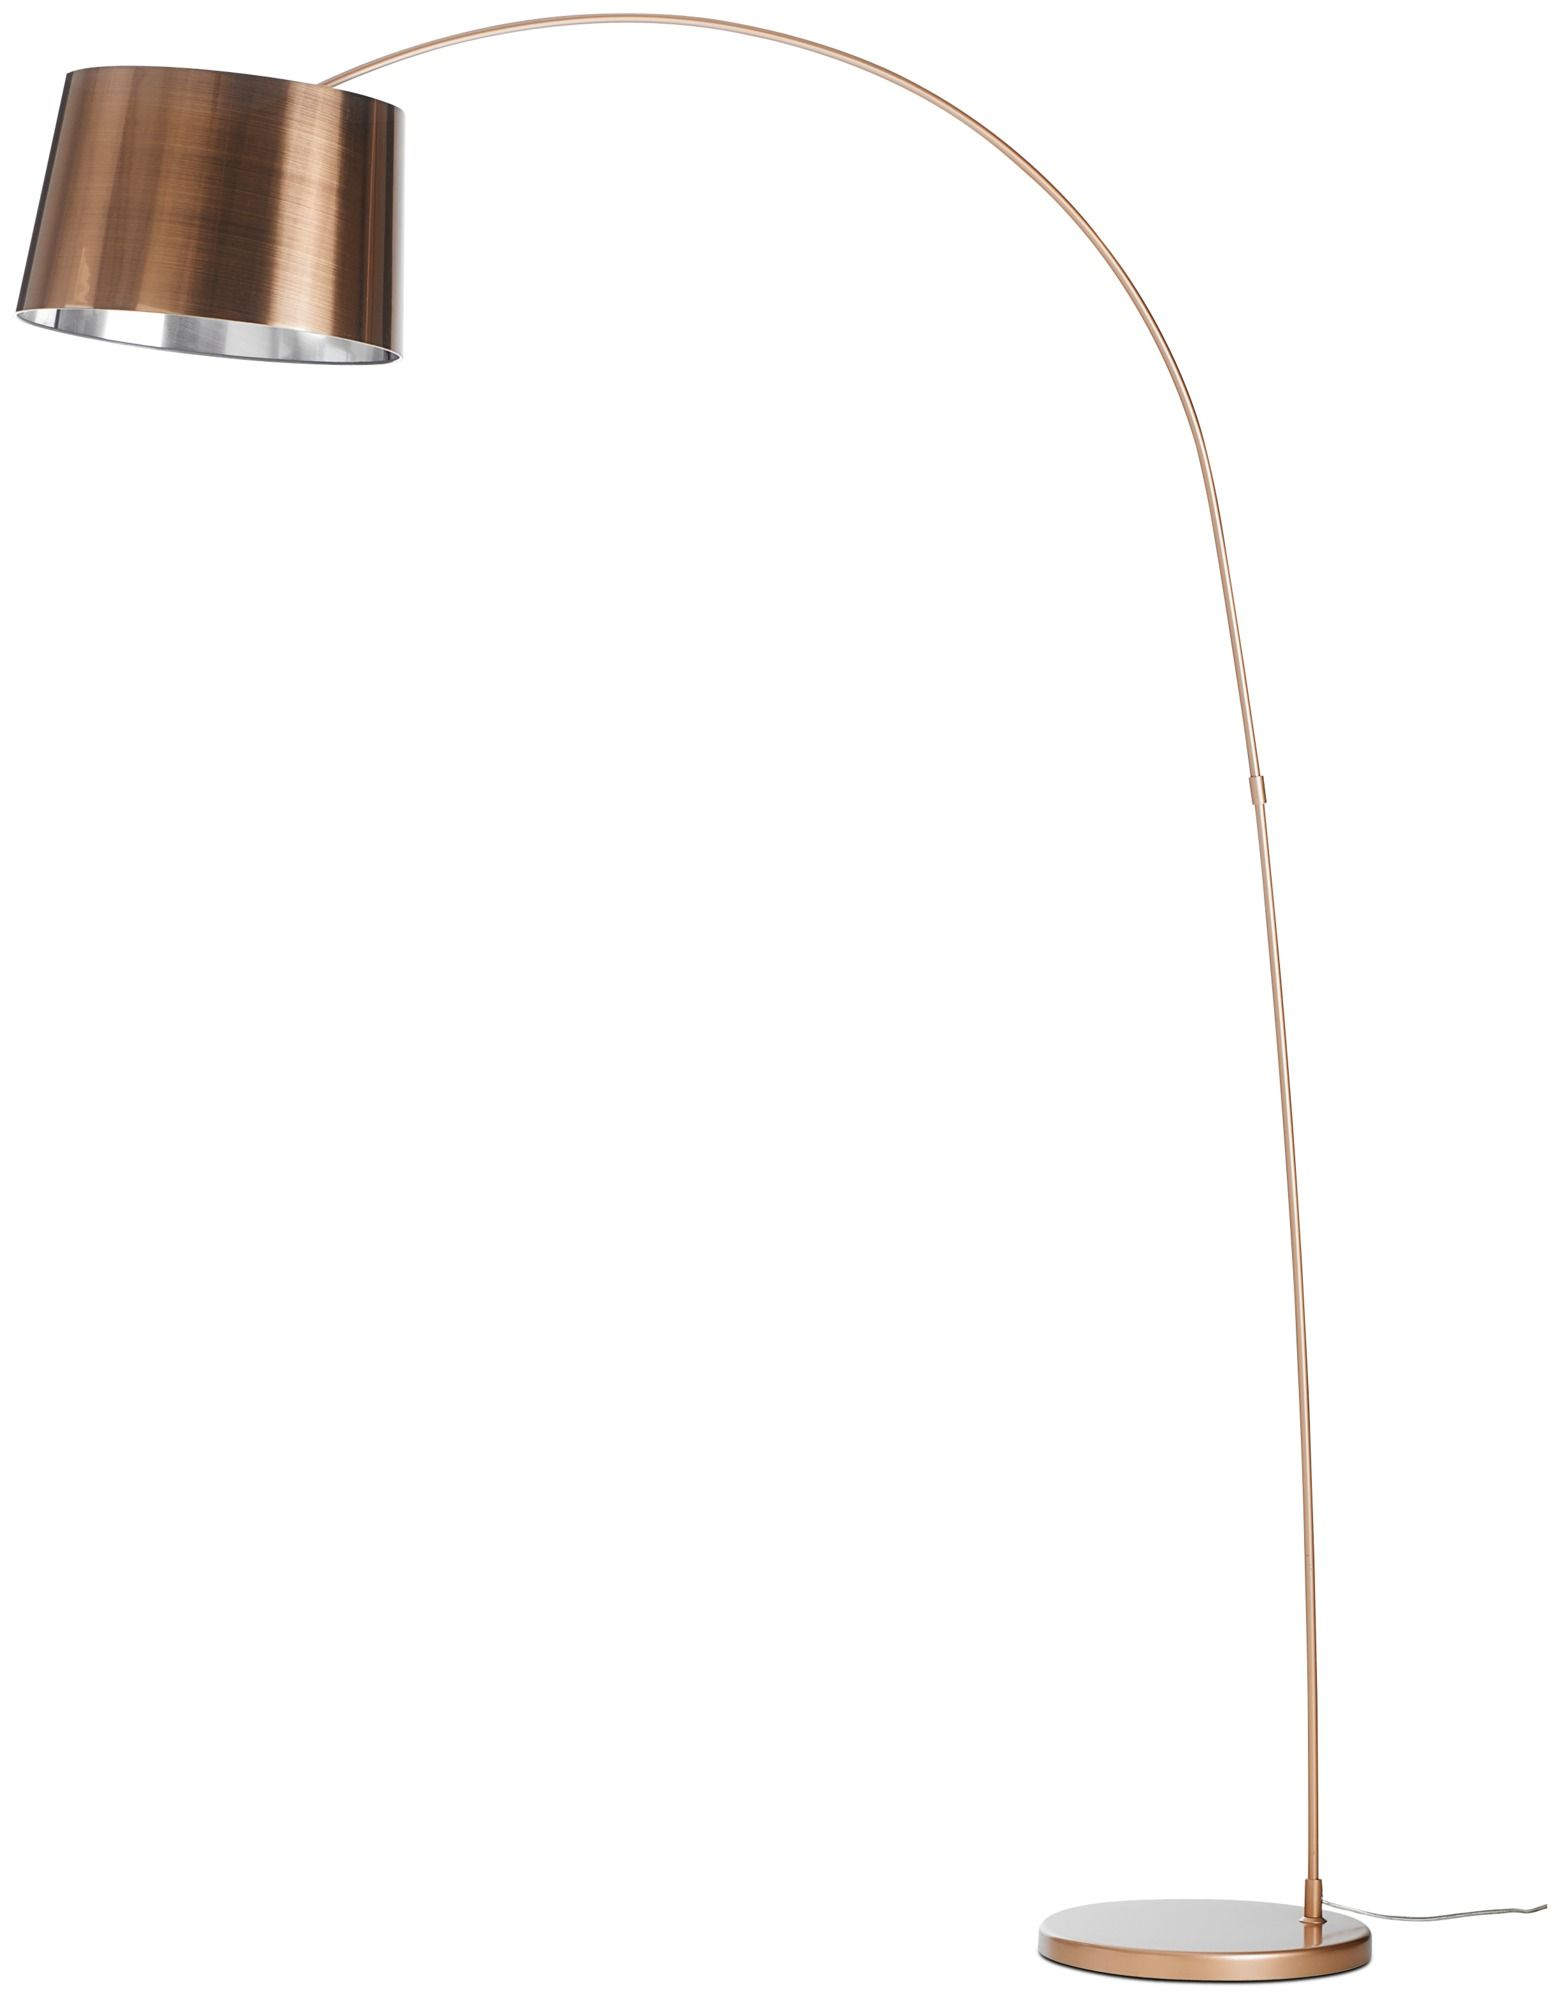 Httpboconcepten caaccessorieslampslampsfloor lamps beautiful lamps from boconcept industrial classic og natual look audiocablefo